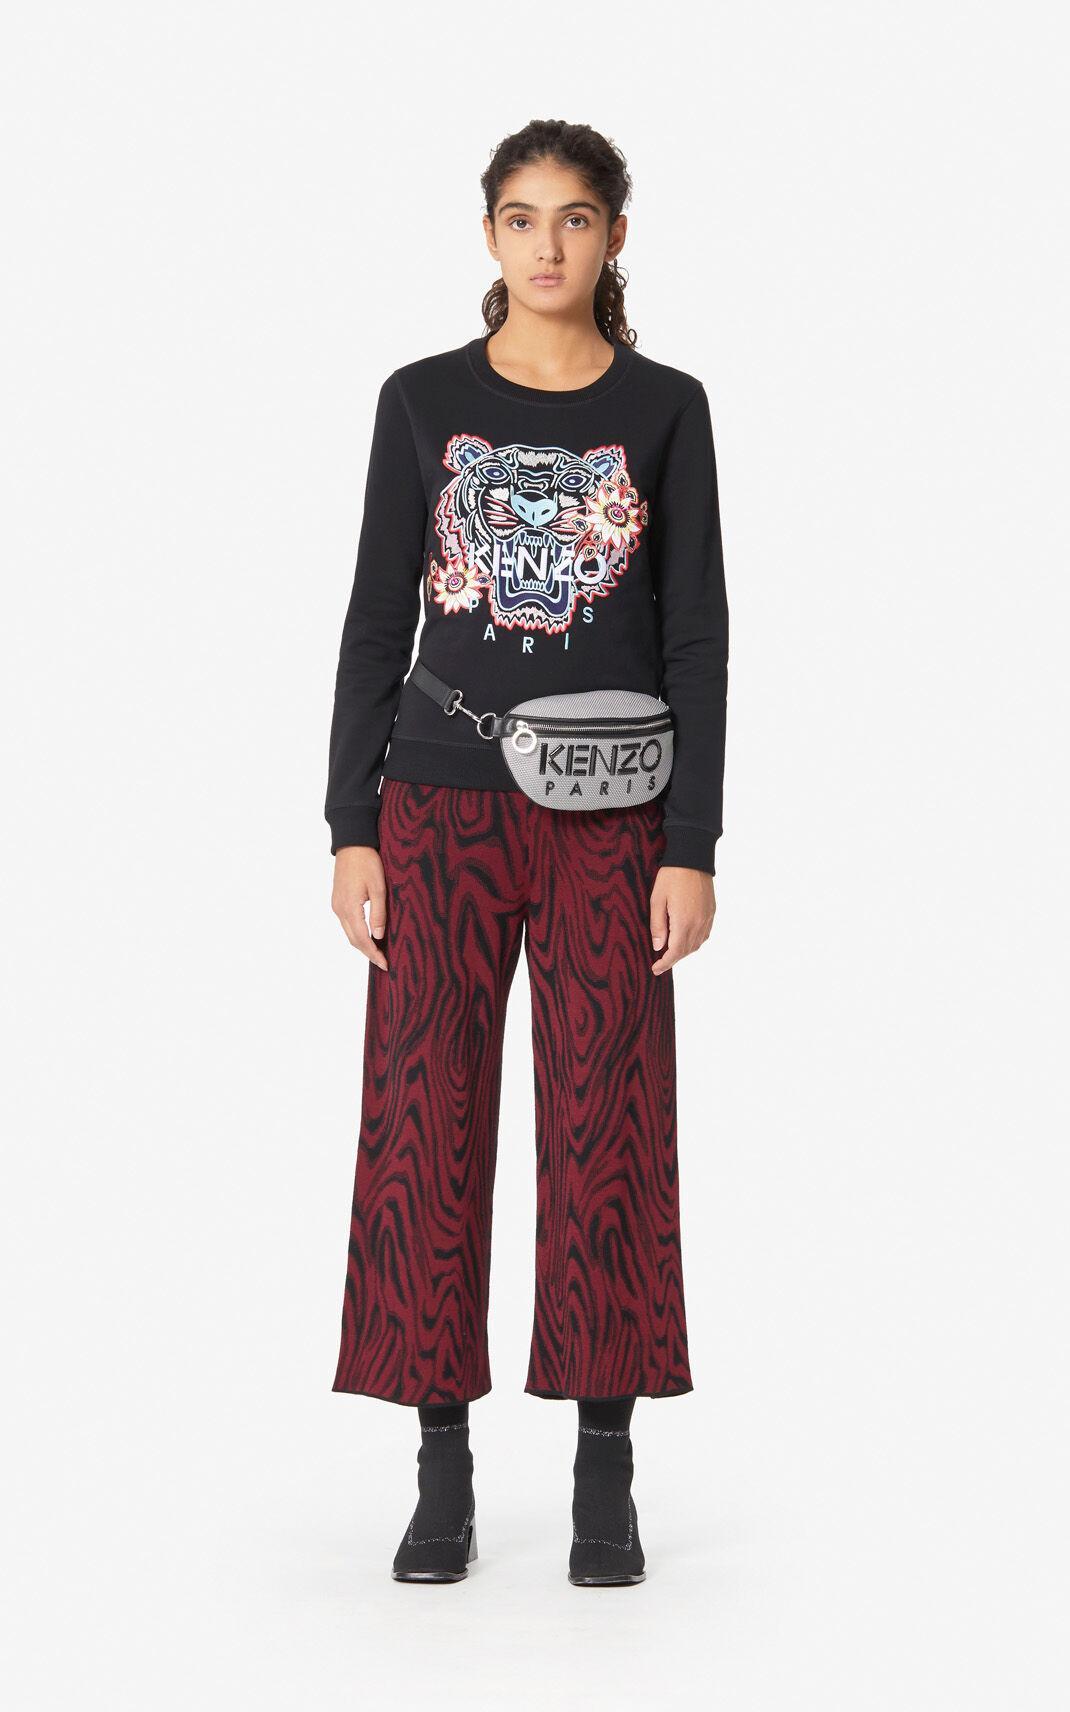 29bea9e2cd KENZO 'passion Flower' Tiger Sweatshirt in Black - Lyst